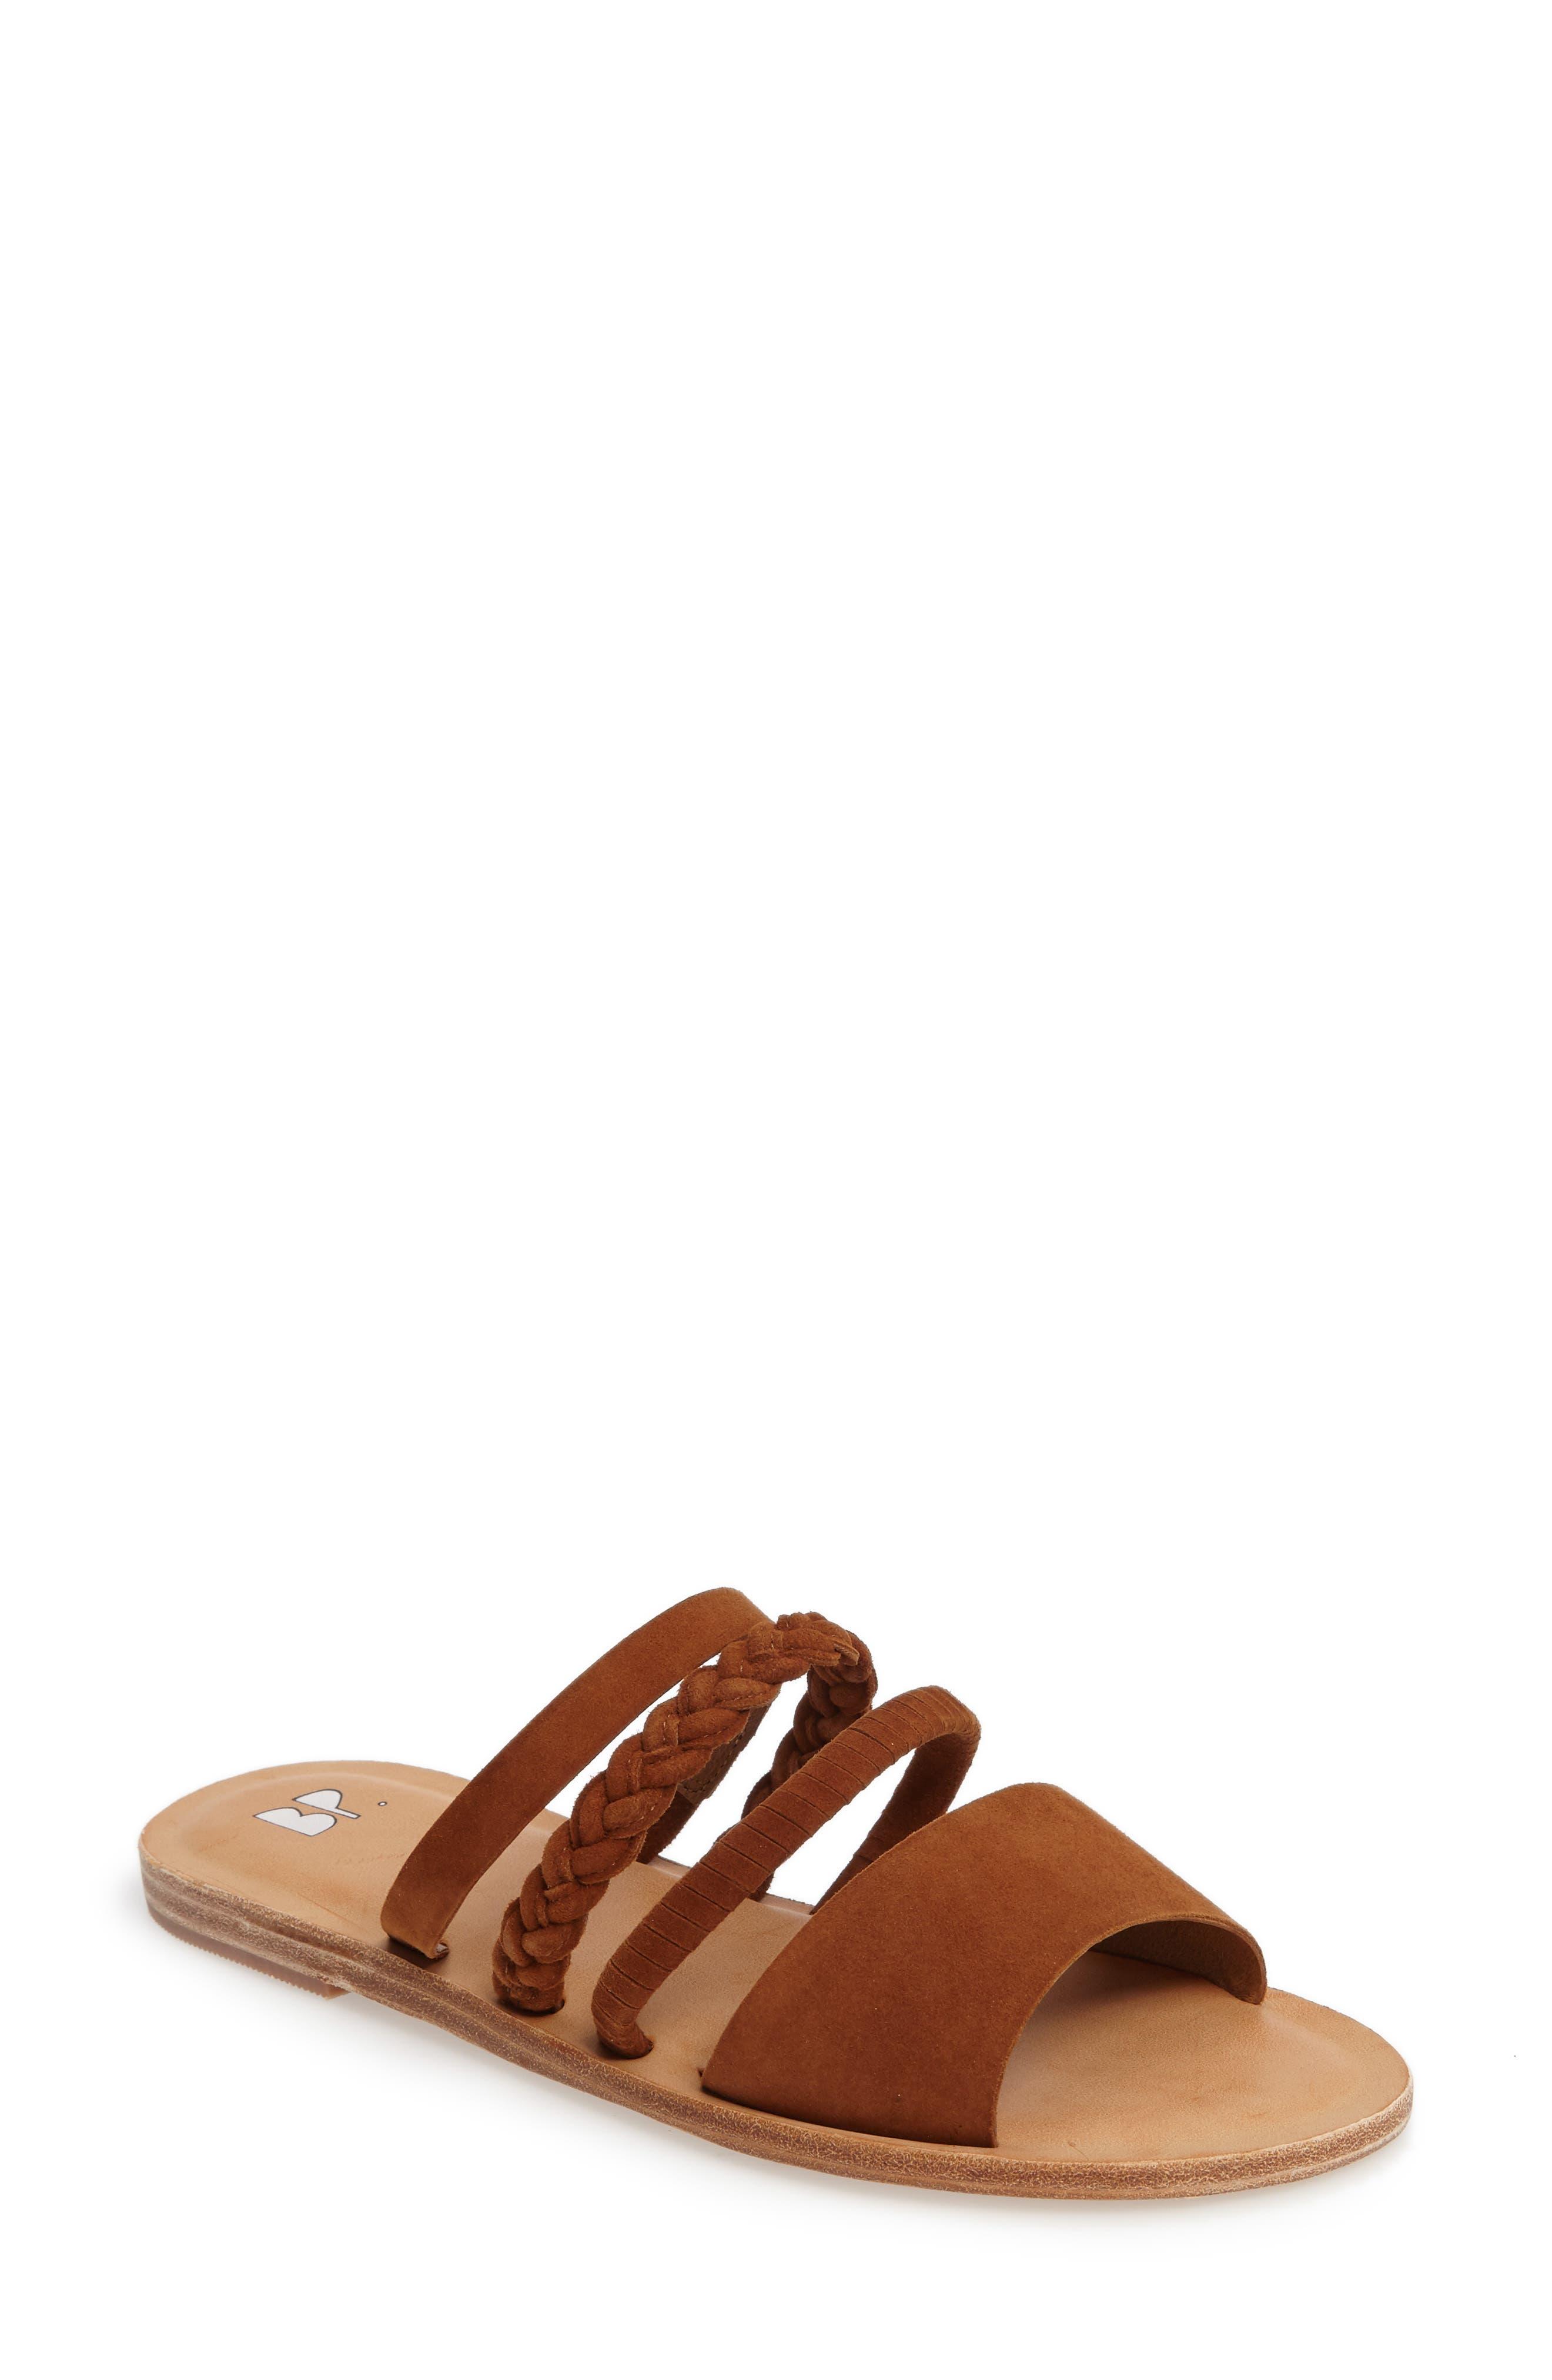 BP. Bayla Strappy Slip-On Sandal, Main, color, 202